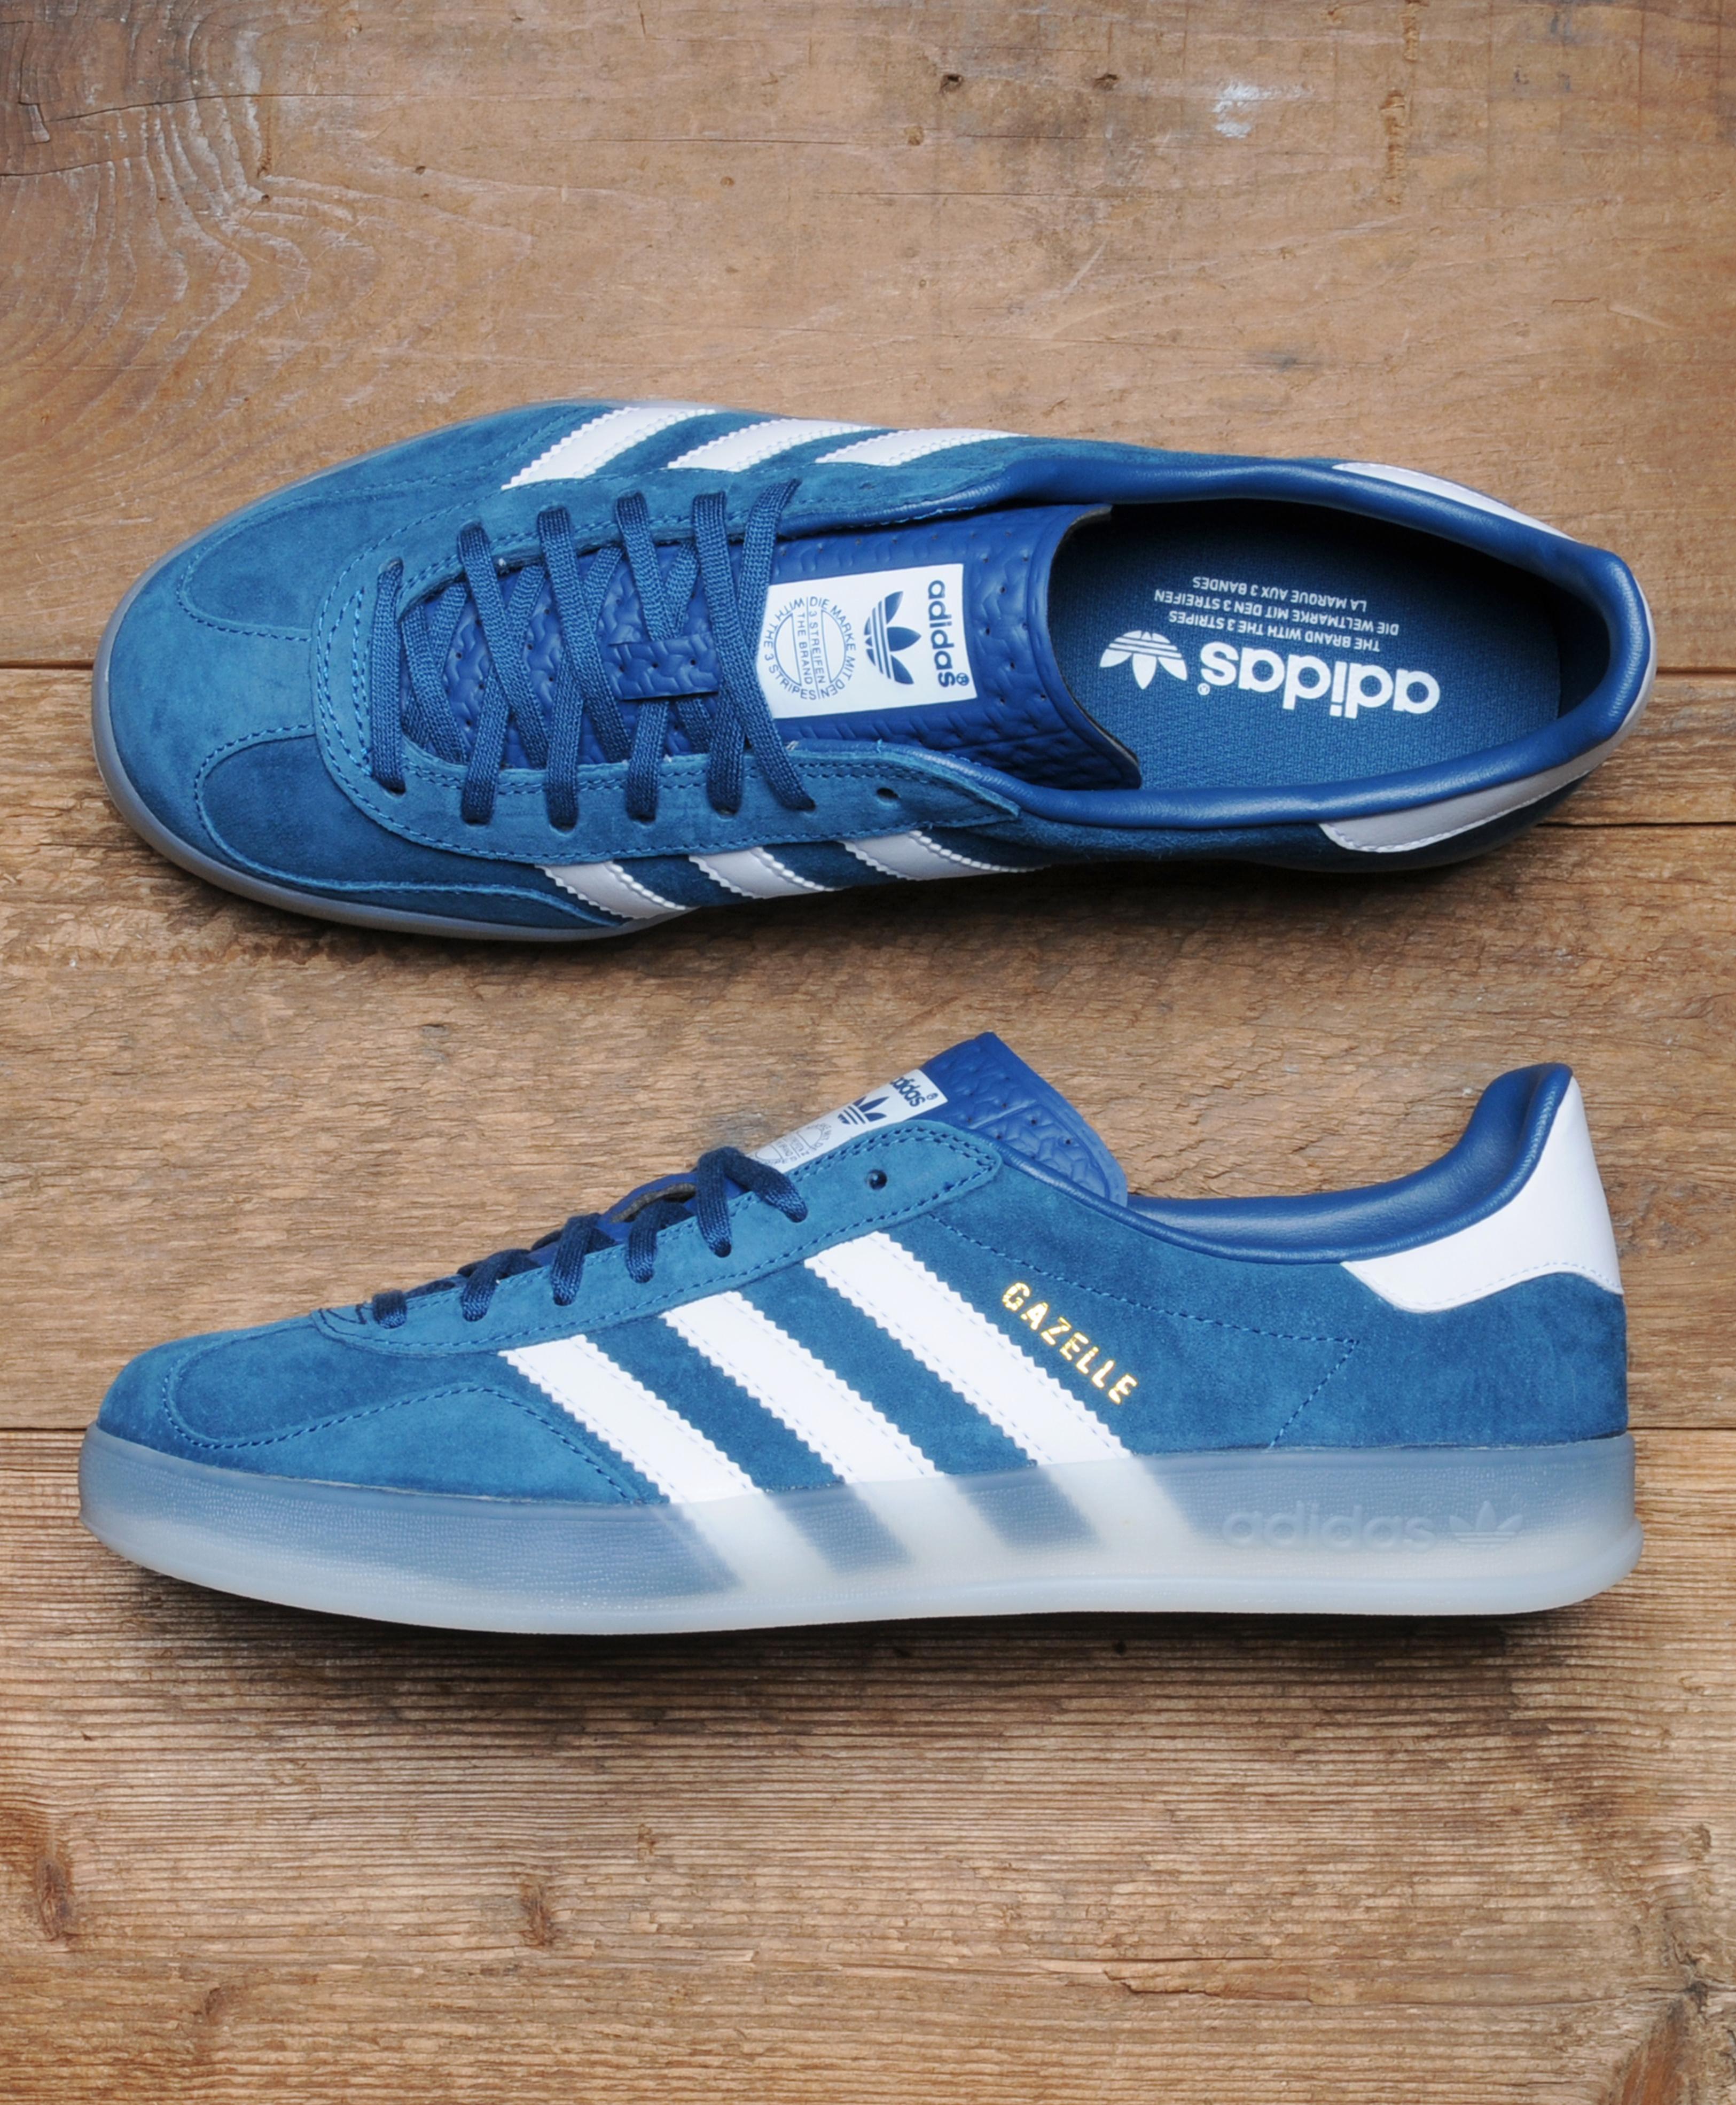 Adidas Originals Gazelle Indoor Blue